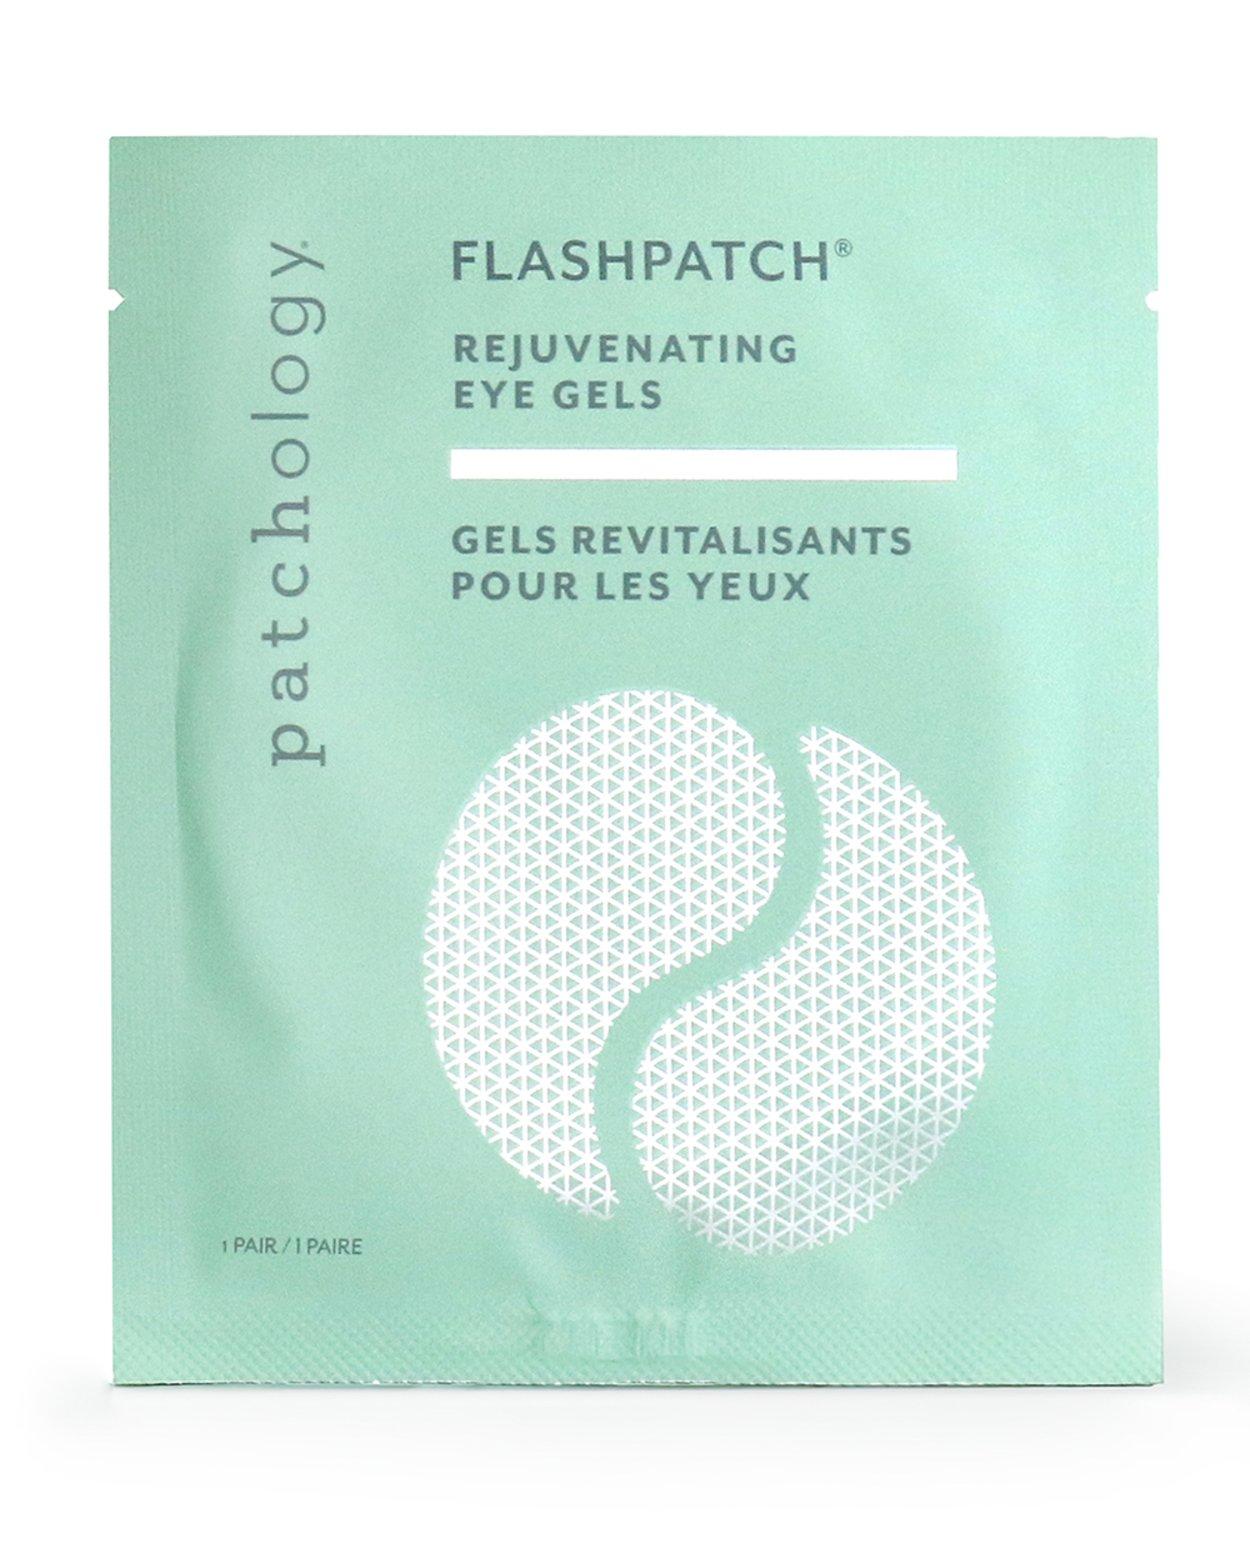 FlashPatch Rejuvenating Eye Gels - Single Pair